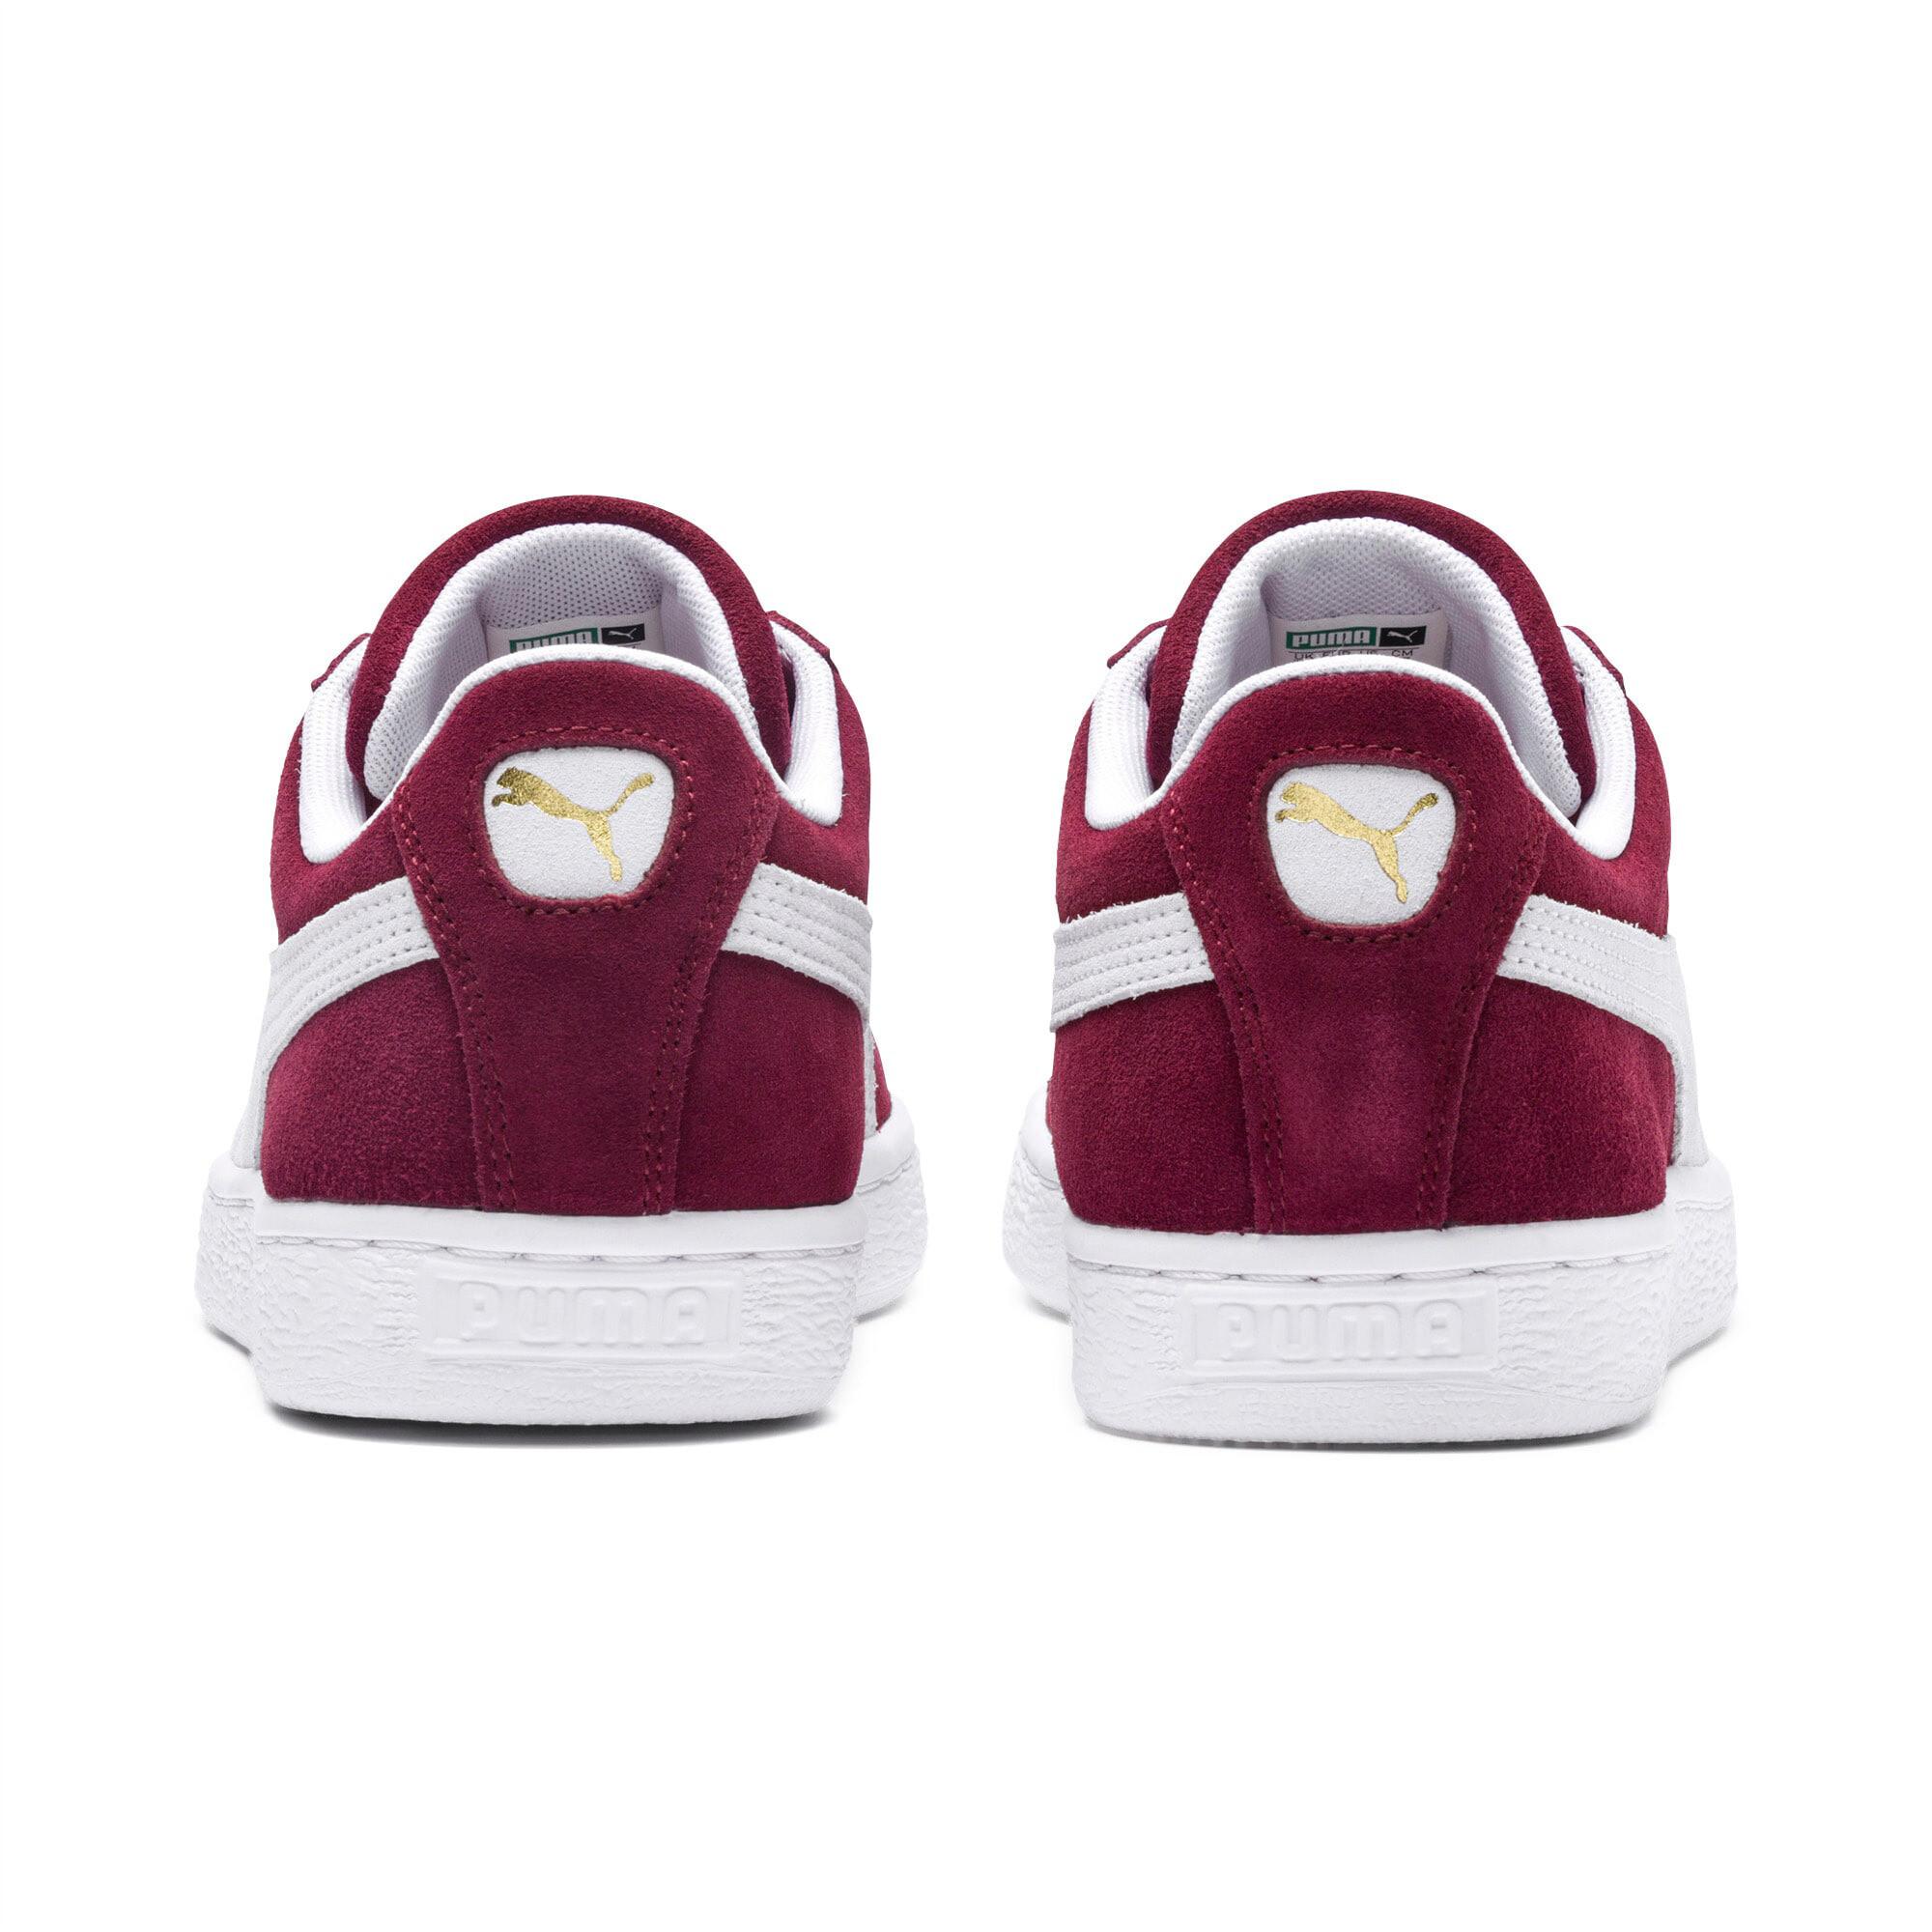 PUMA-Suede-Classic-Sneakers-Men-Shoe-Sport-Shoe thumbnail 18